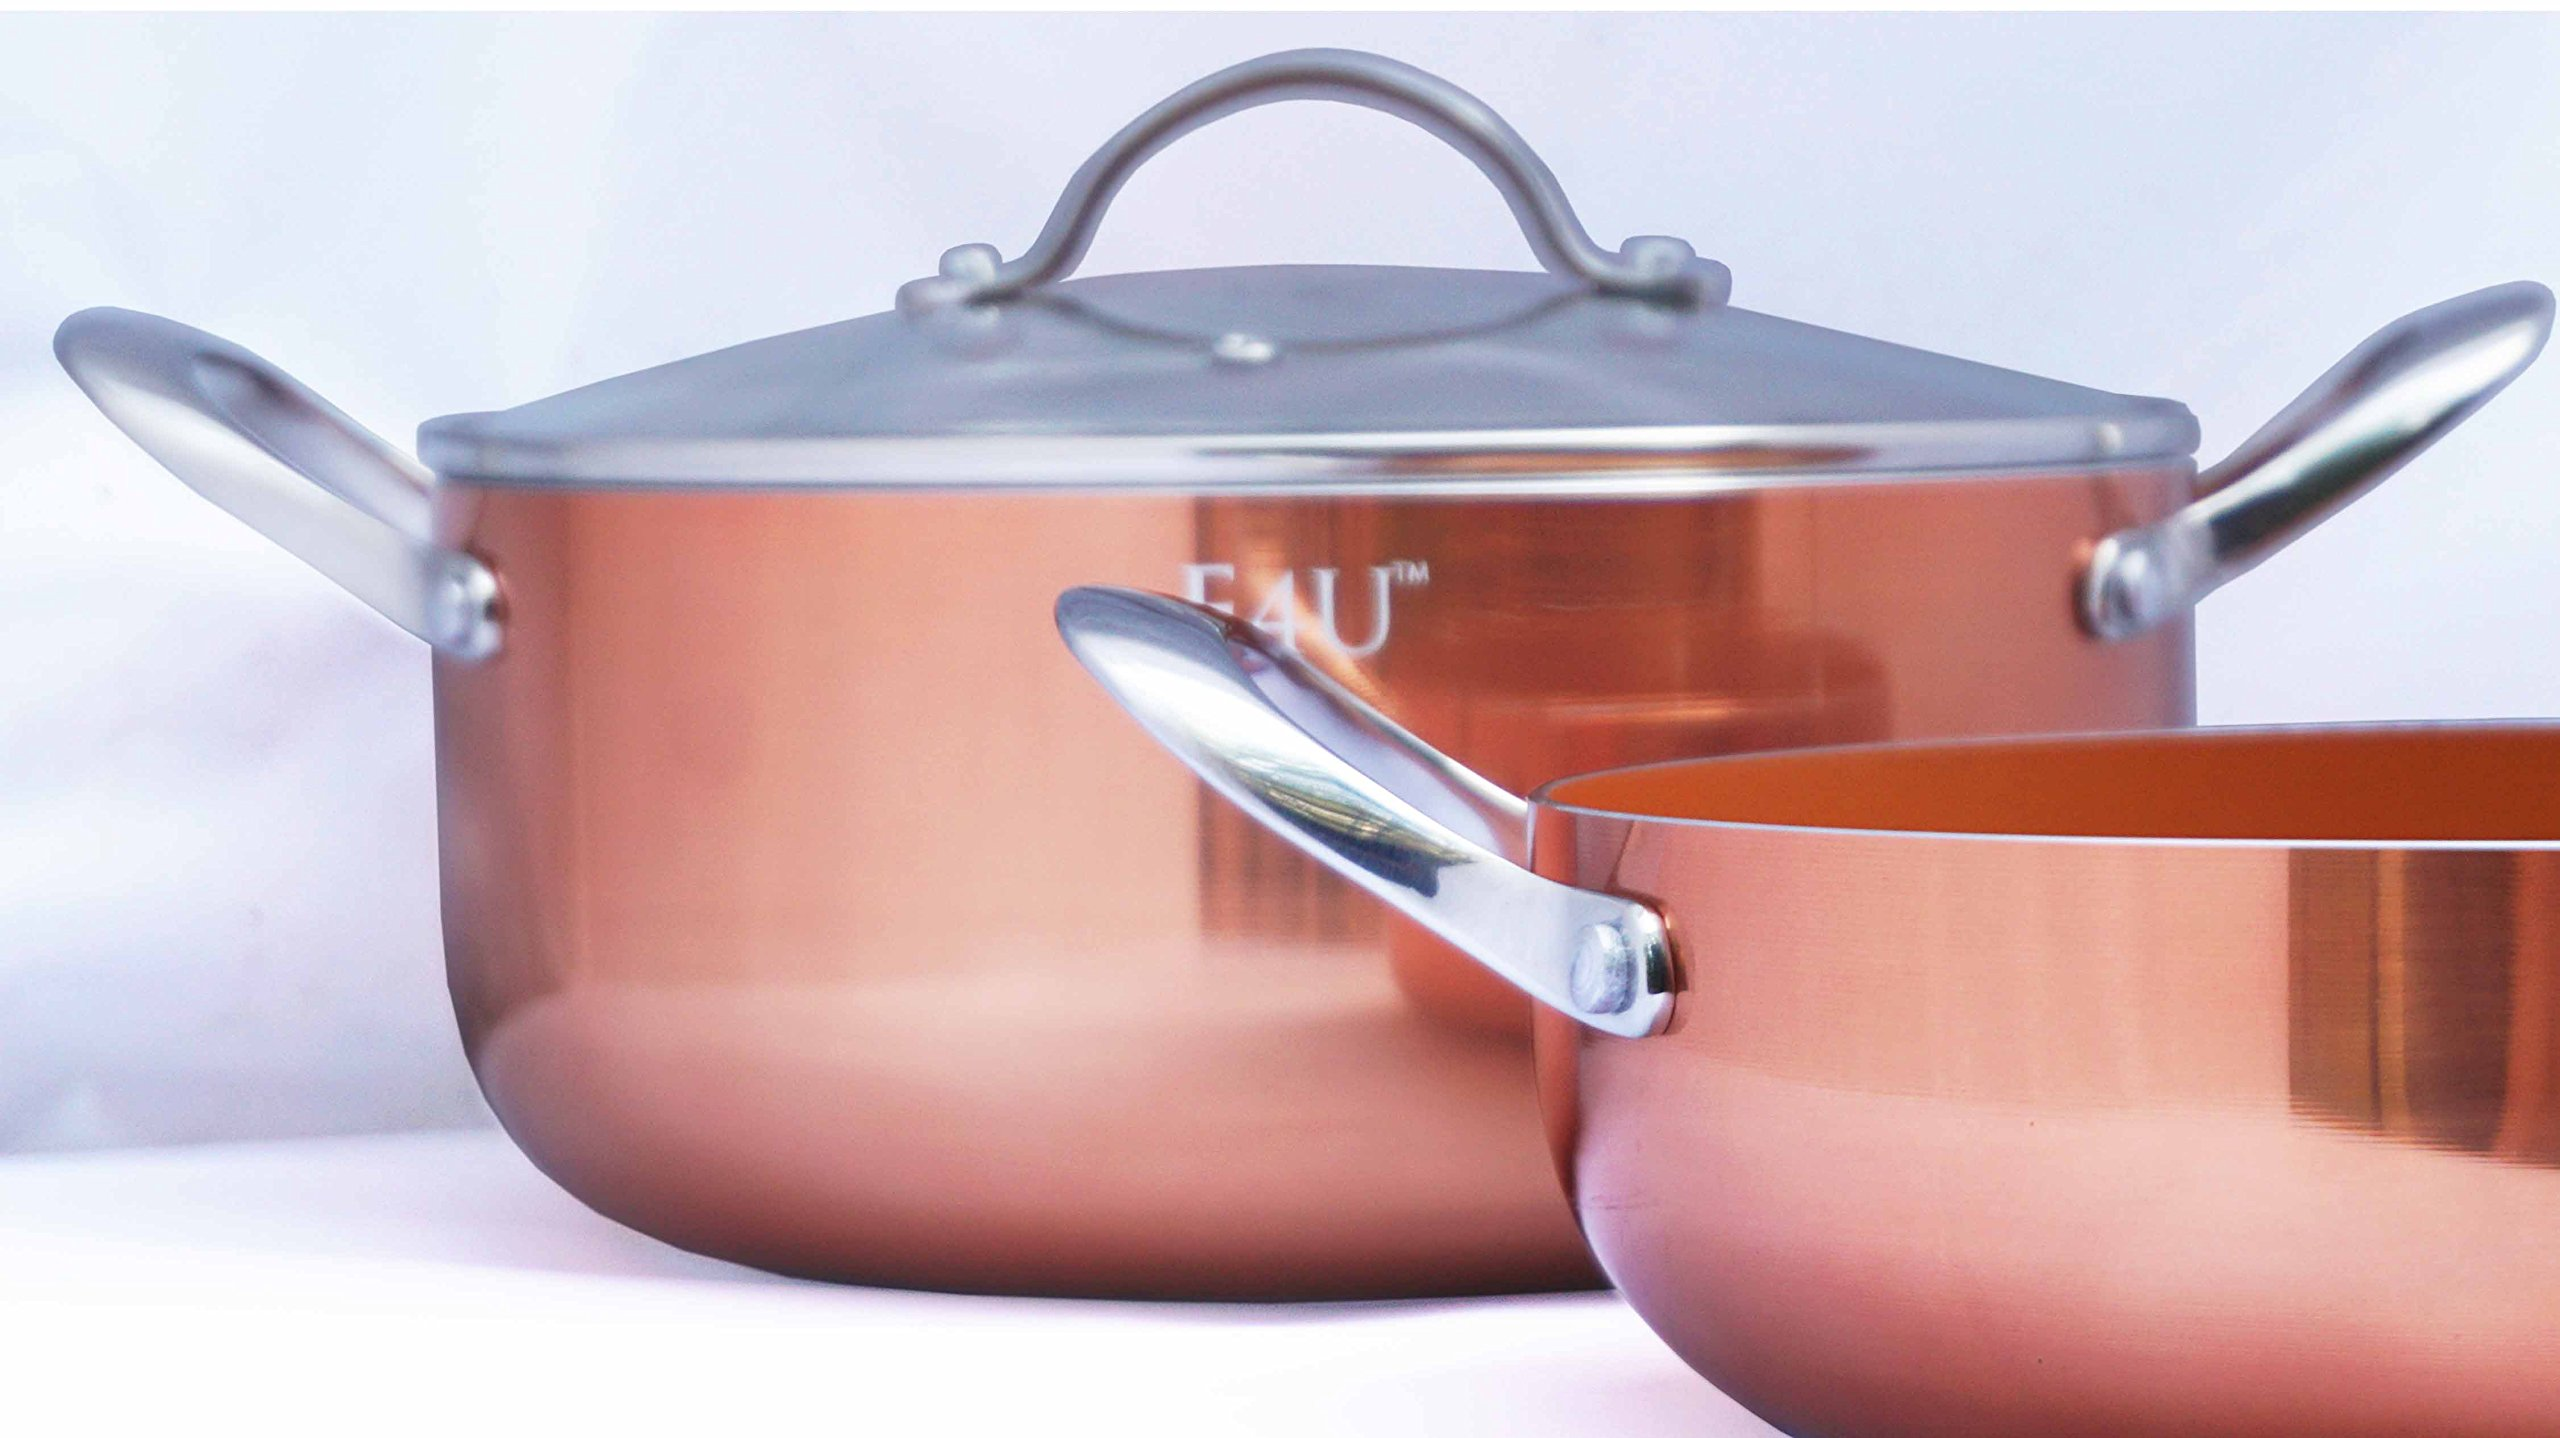 Copper Kitchen Dutch Oven - Ceramic Copper Induction Bottom Pots - Three Piece Deep Dish Casserole